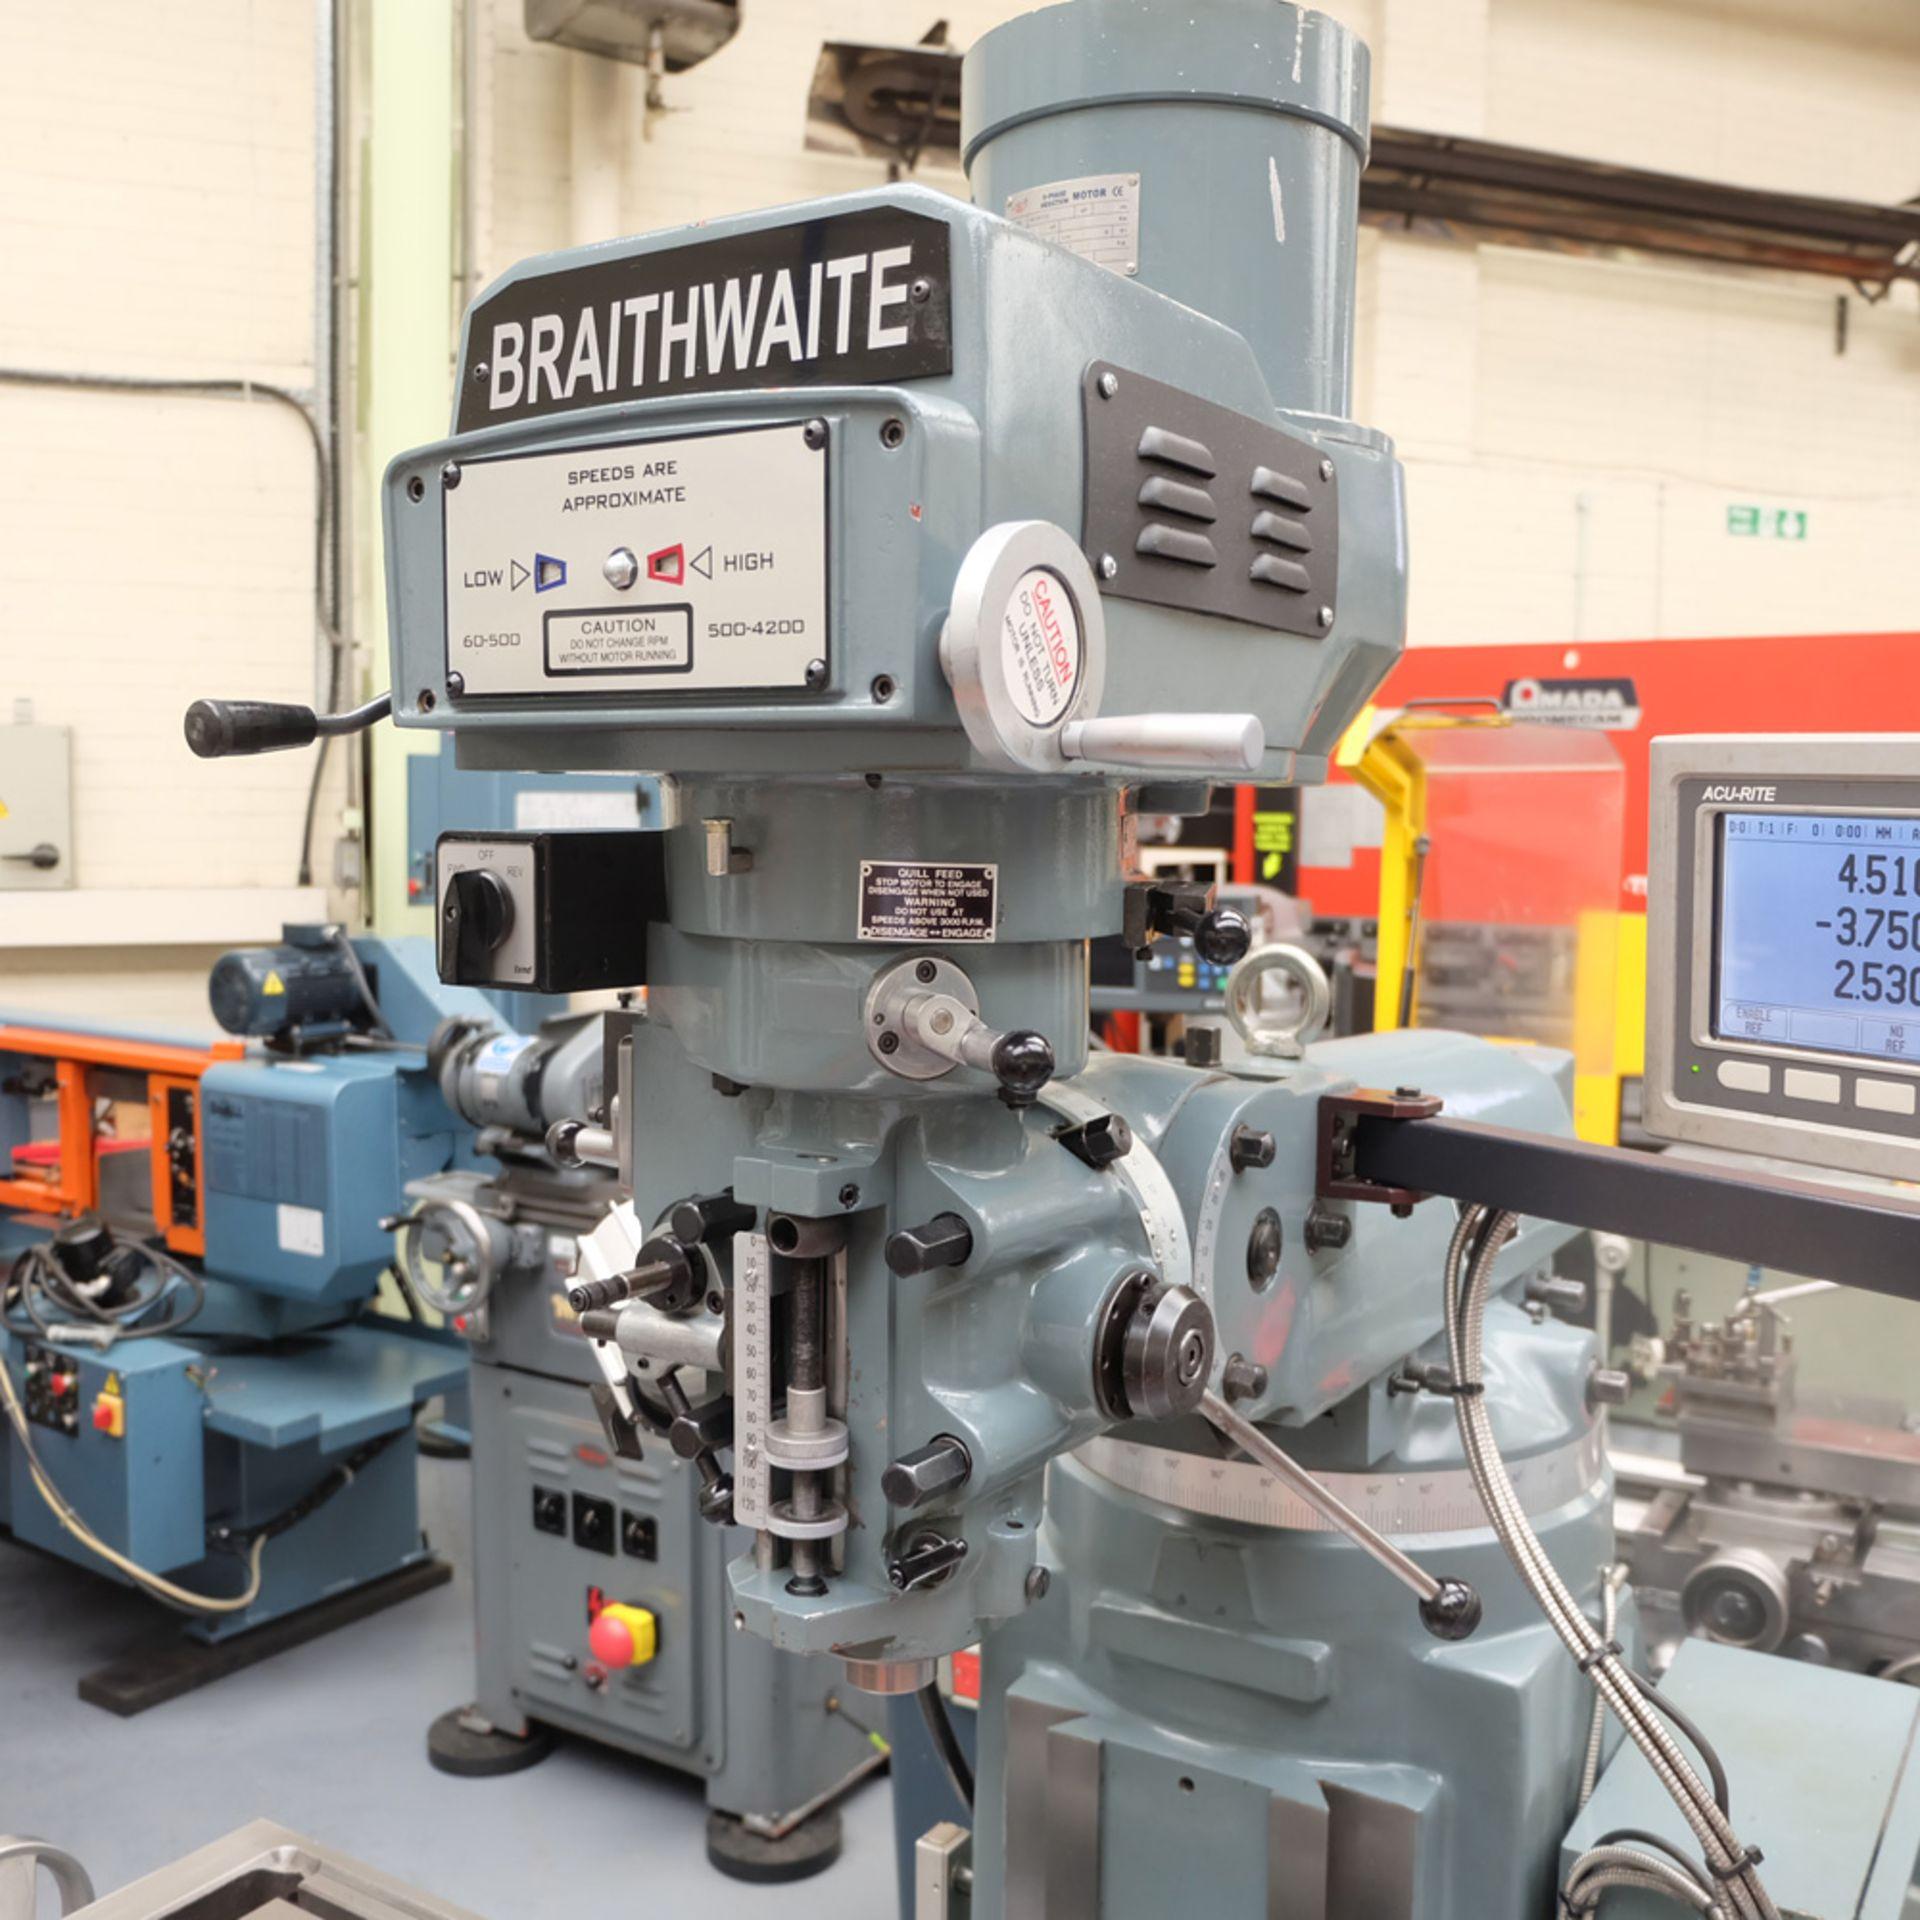 Braithwaite Model 6323B 3HP Vari Speed Turret Mill. - Image 2 of 20